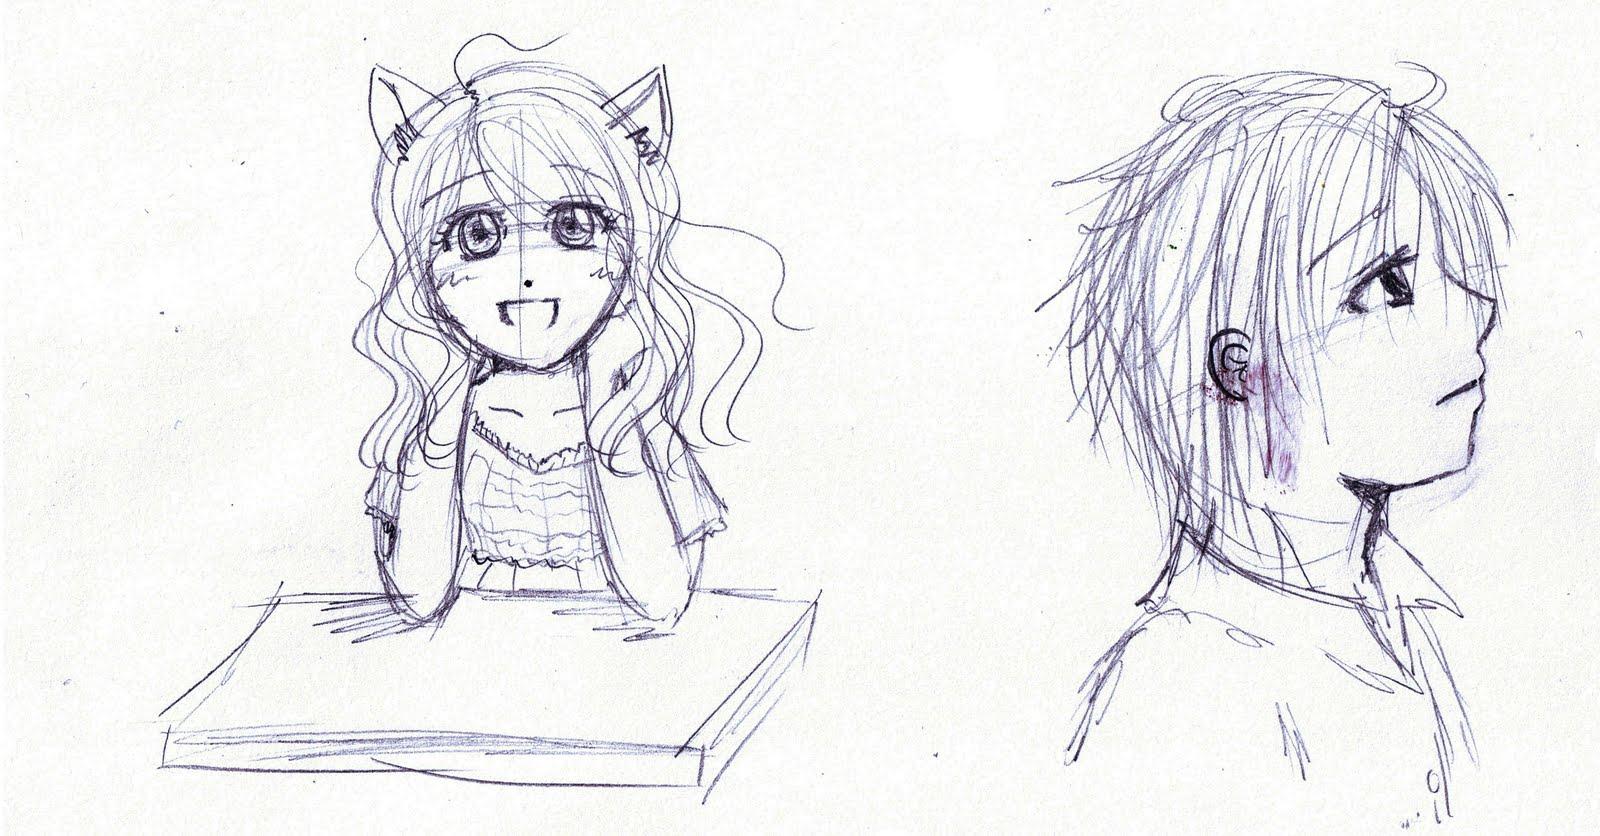 Destino Mangaka Mejorar tu dibujo II Ejercicio de personajes